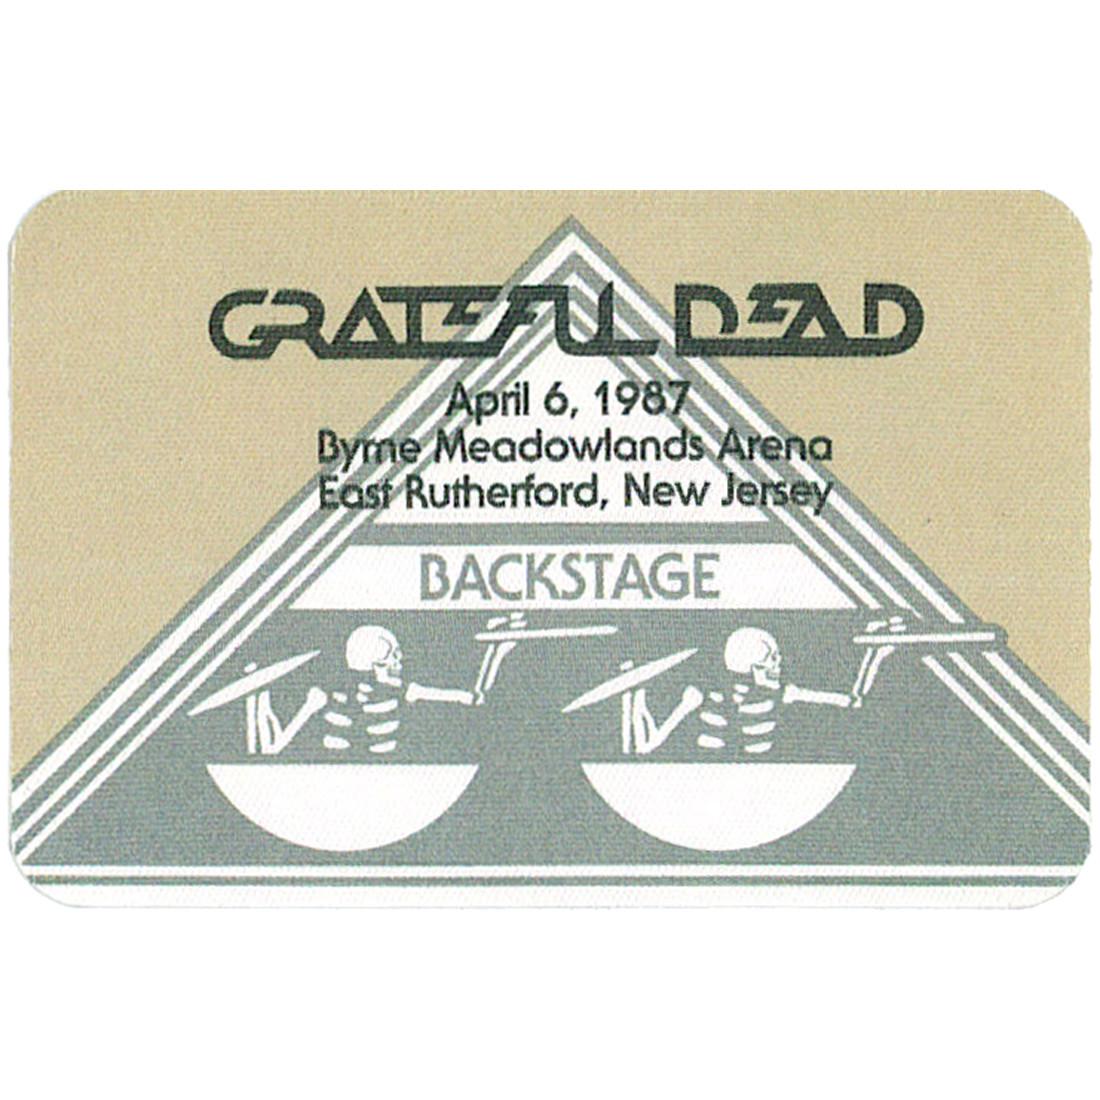 Grateful Dead 1987 04-06 Backstage Pass